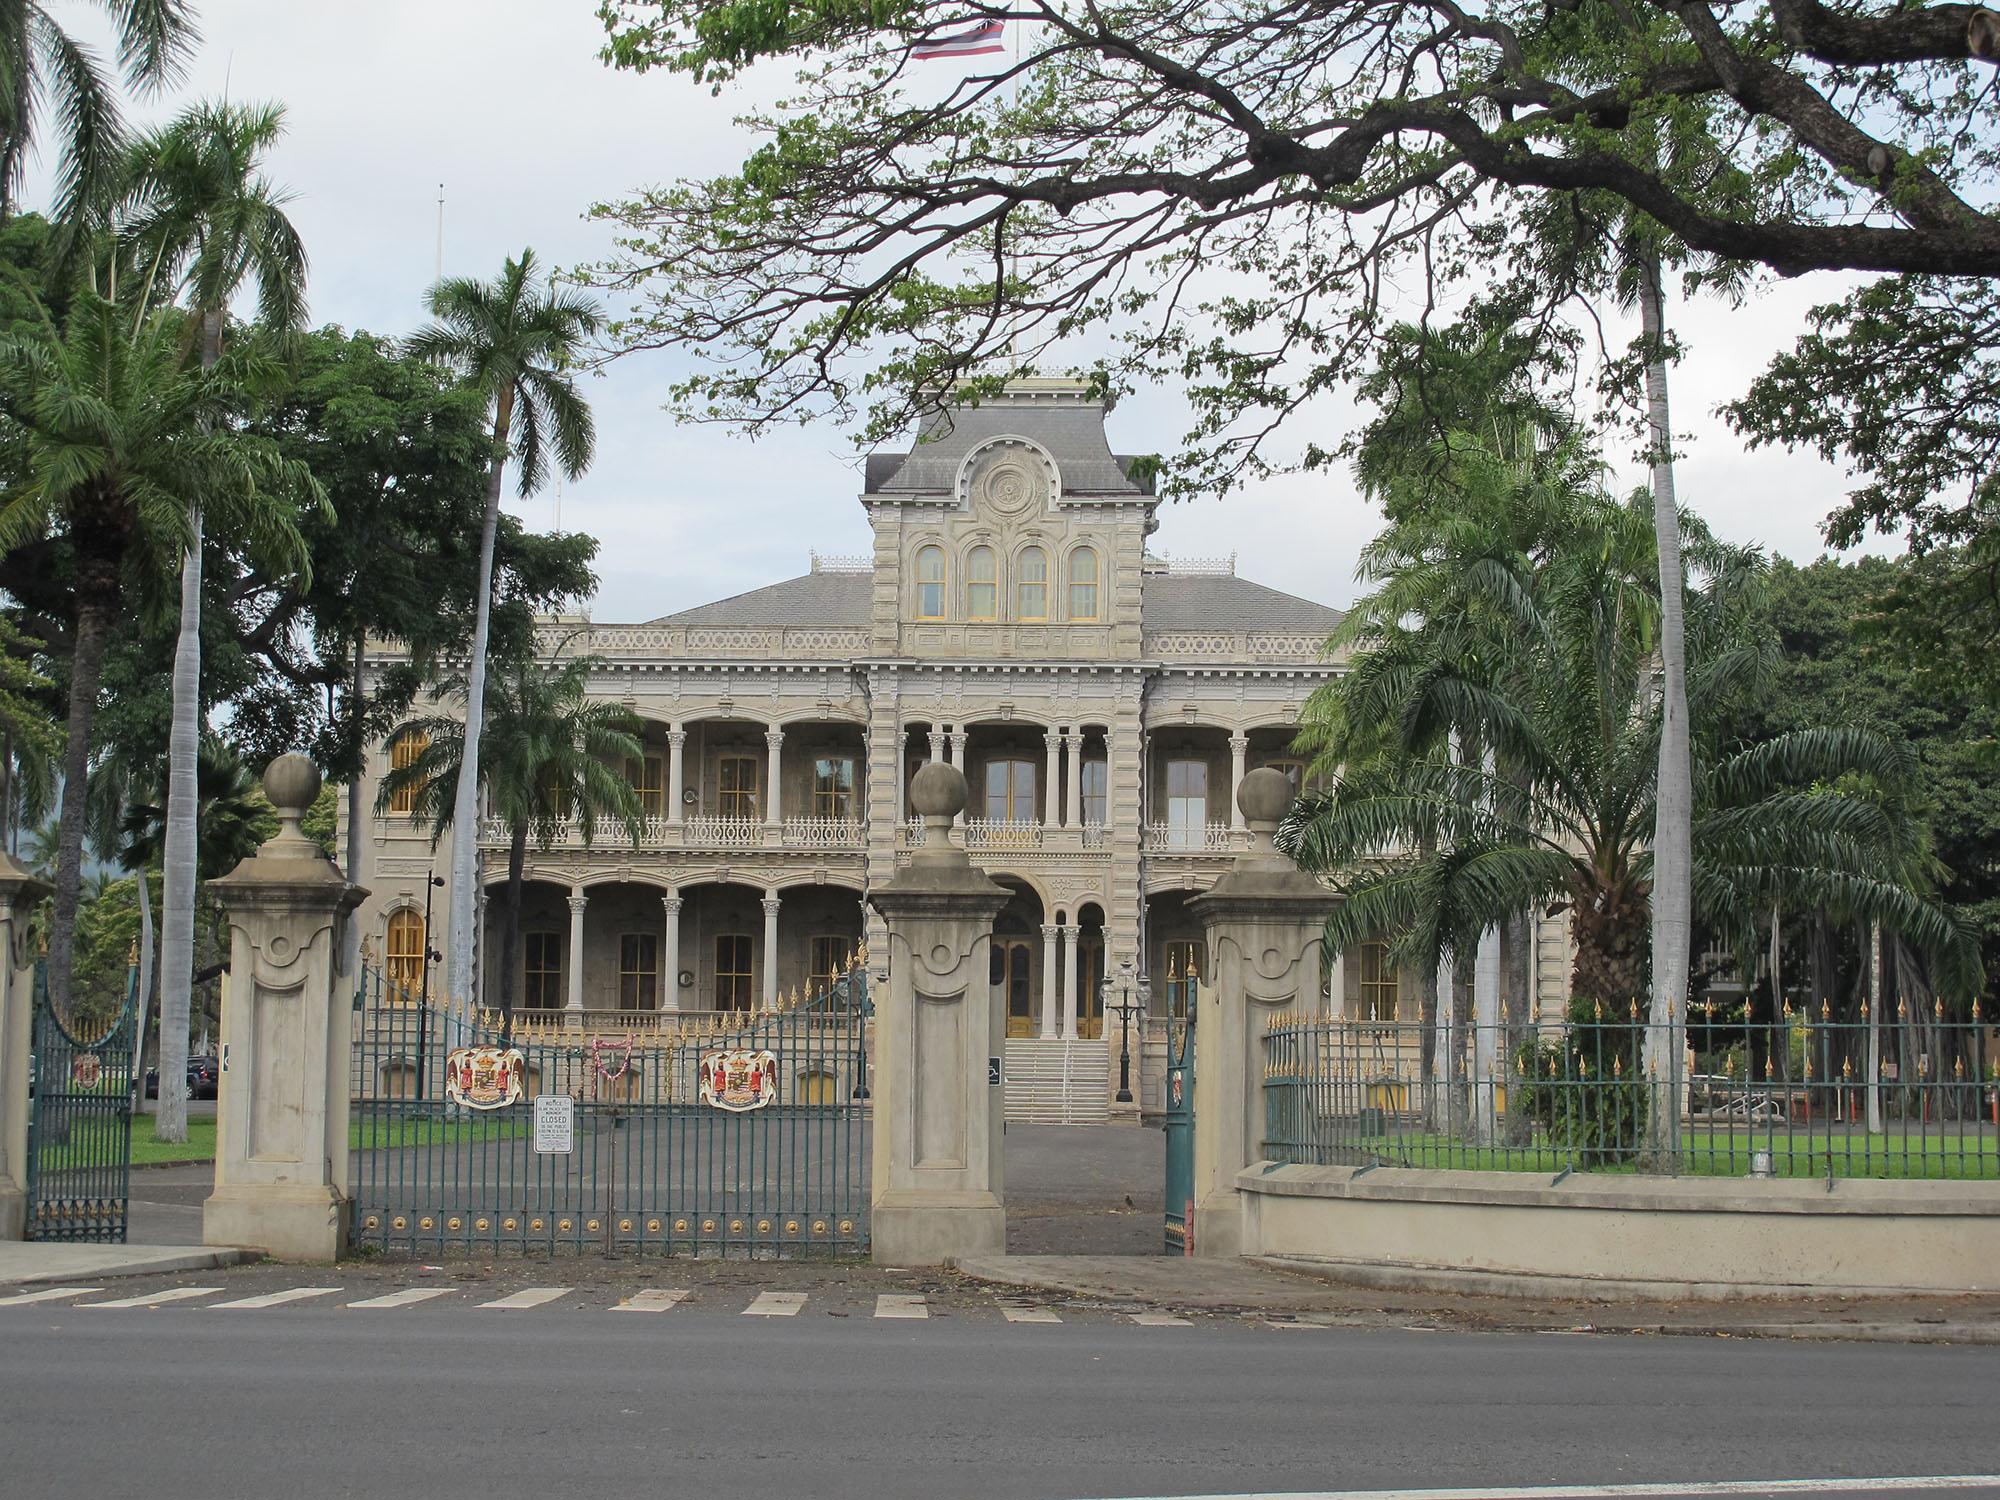 Fig. 12 ʻIolani Palace, Oʻahu, May 2011. Photo: ©Sally Promey